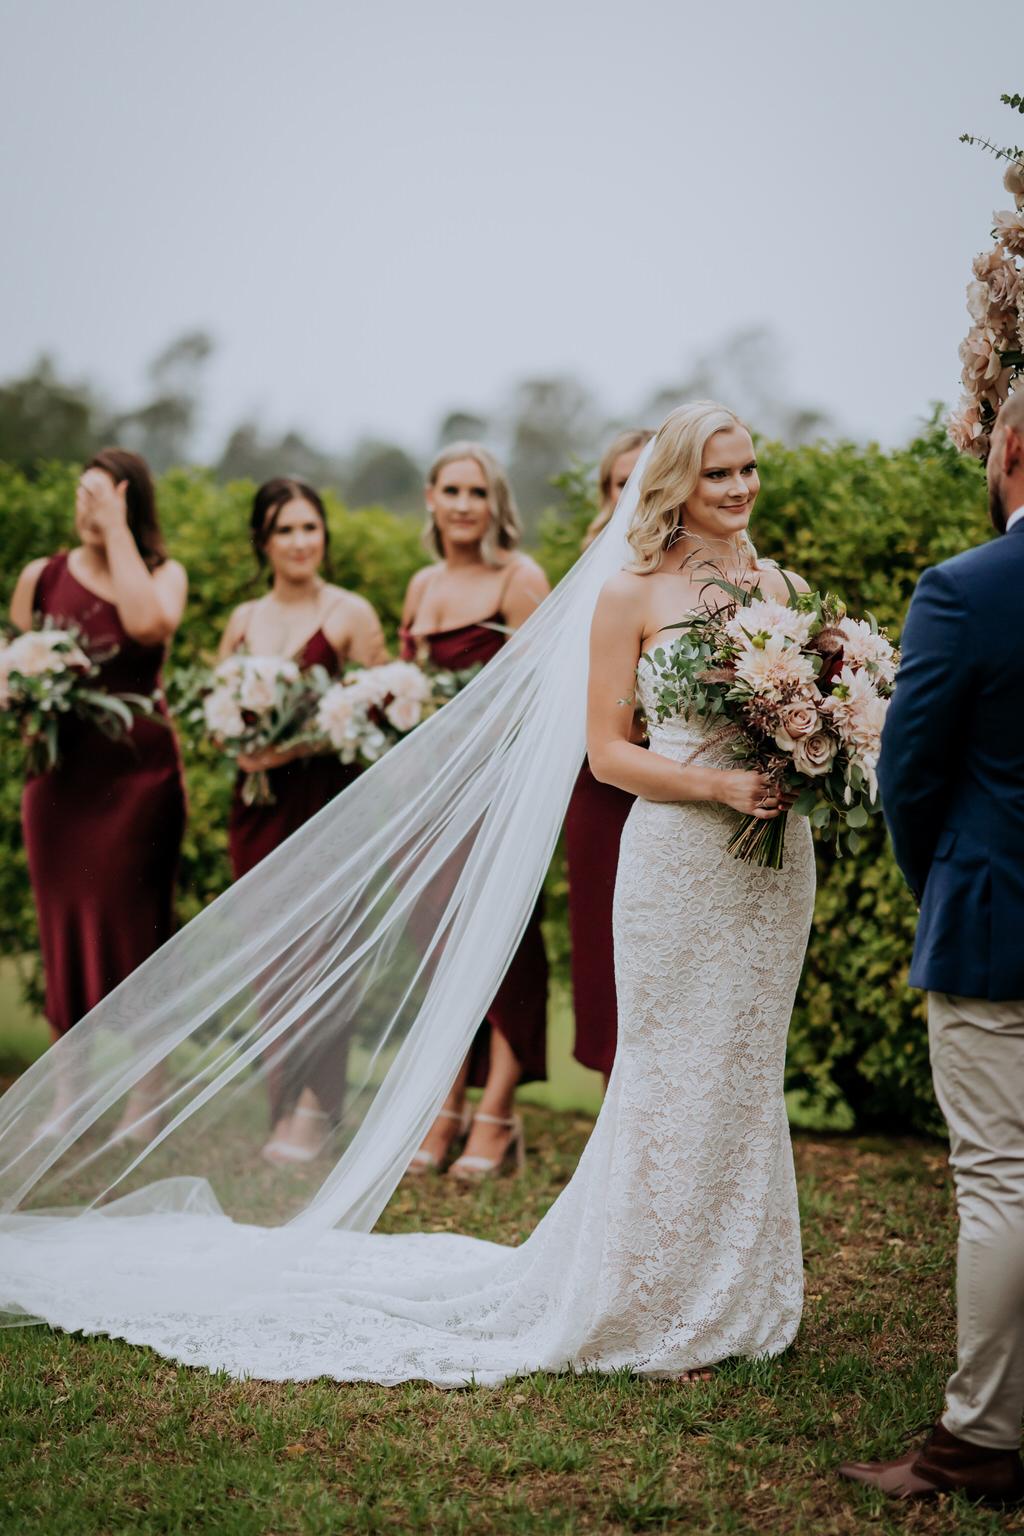 ava-me-photography-jade-simon-loxley-bellbird-hill-kurrajong-heights-wedding-419